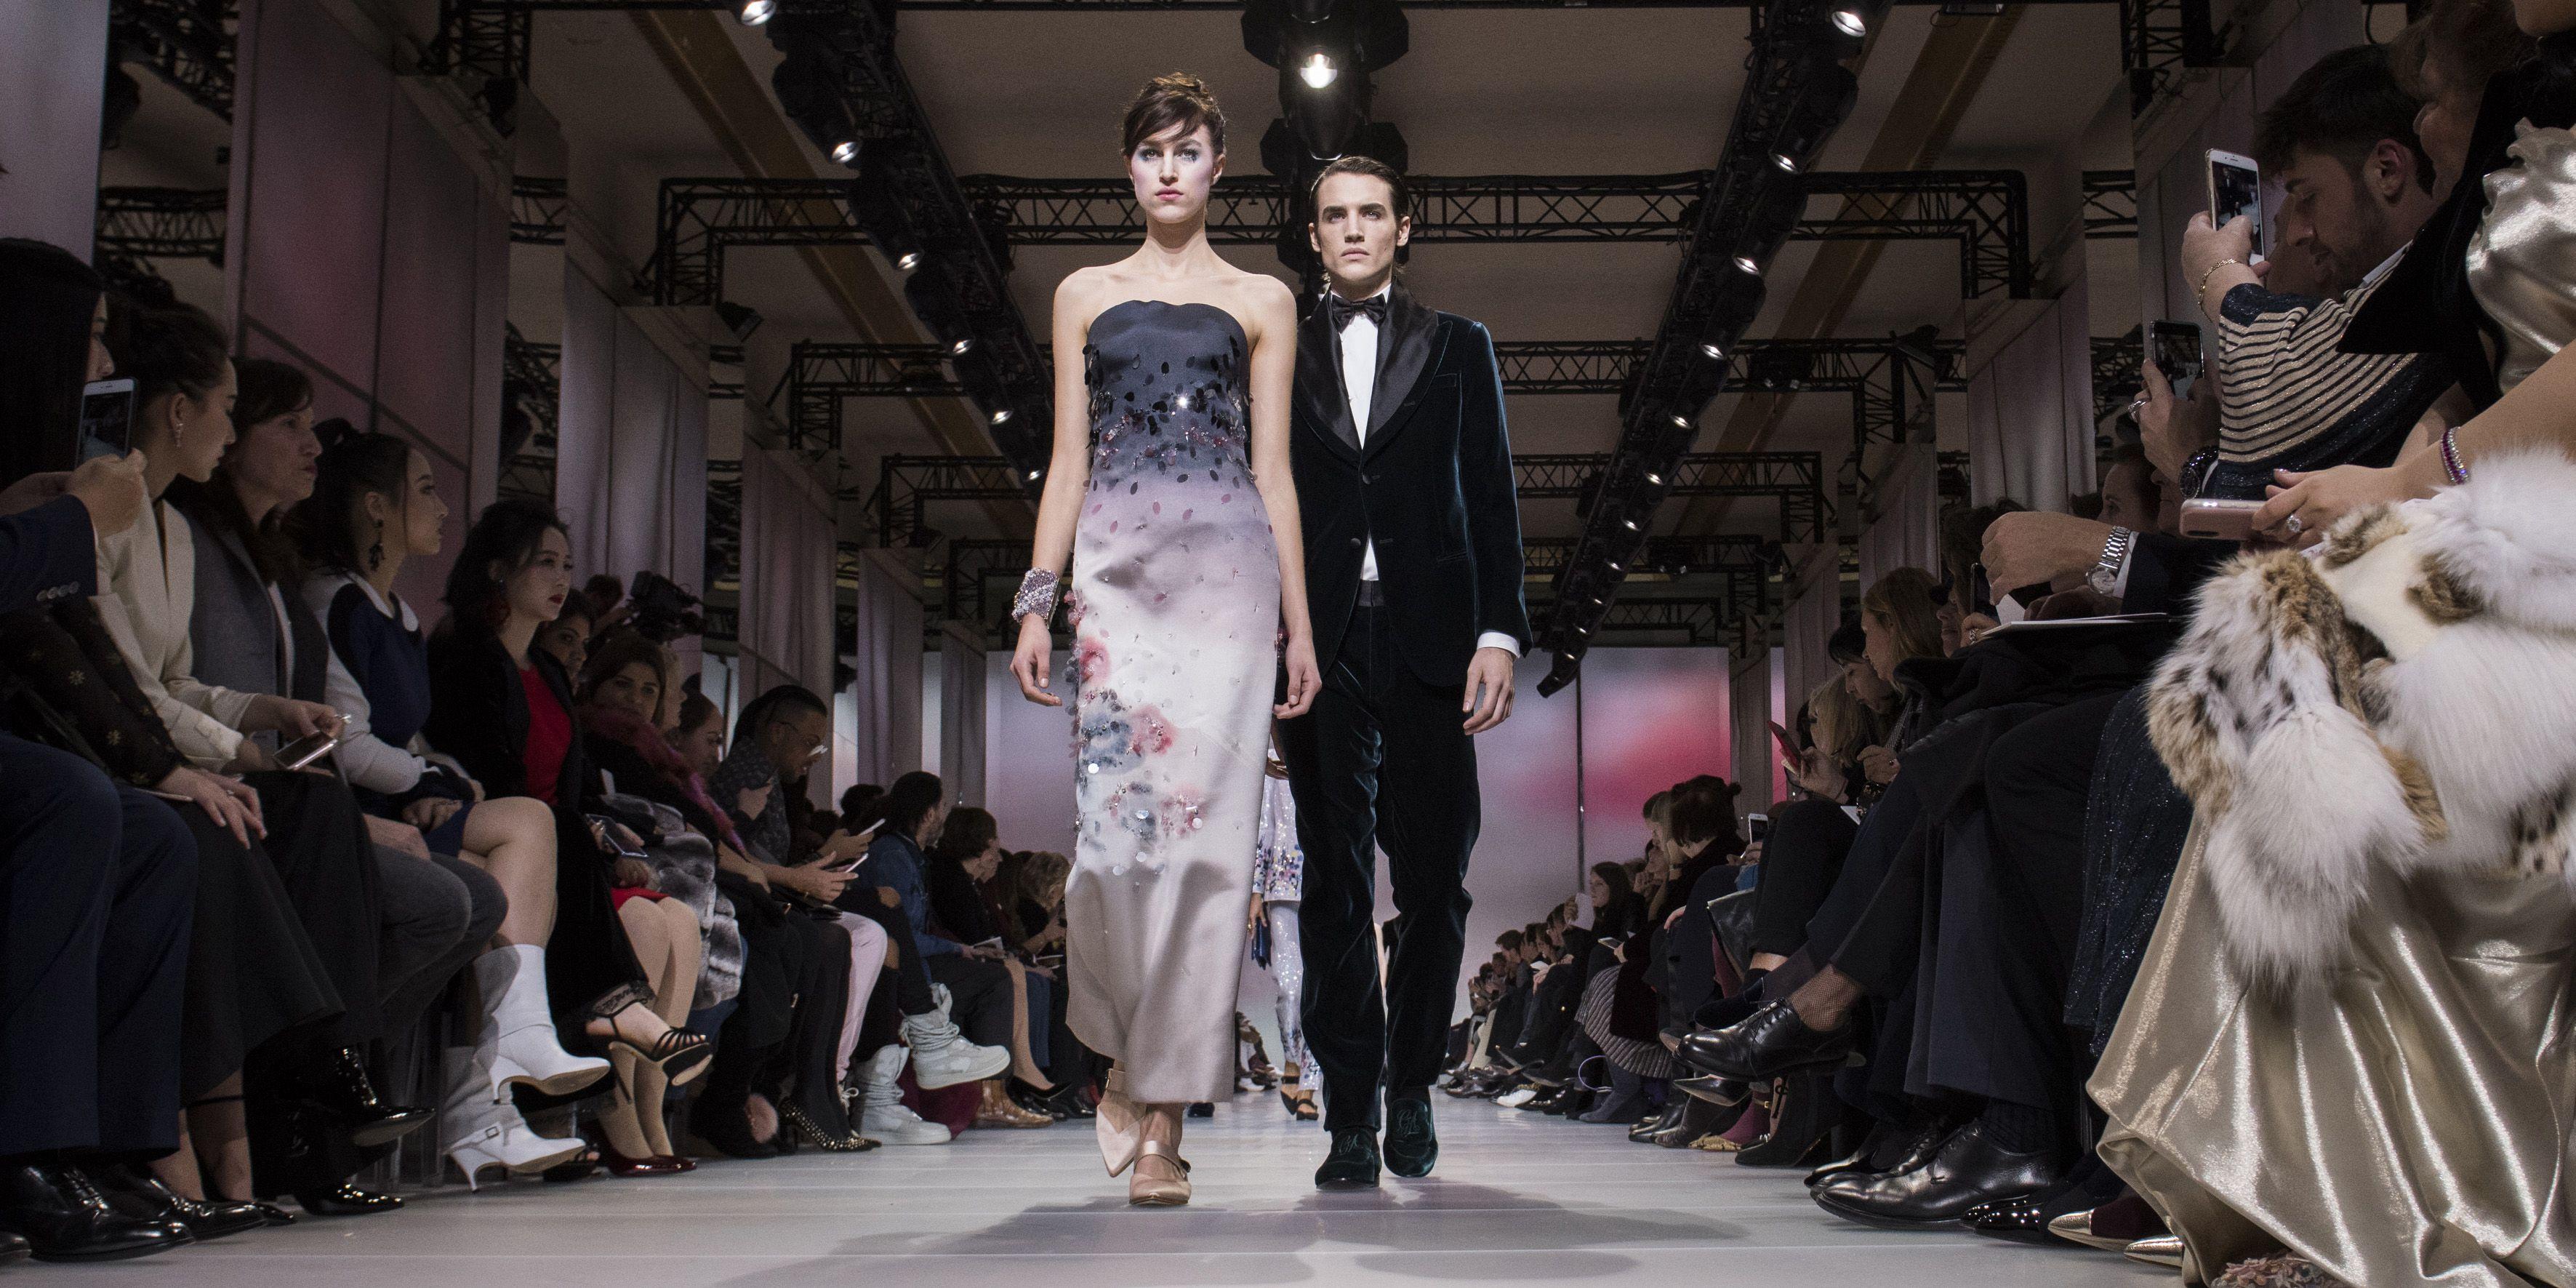 8e0d738020fa Armani couture spring summer 2018 collection